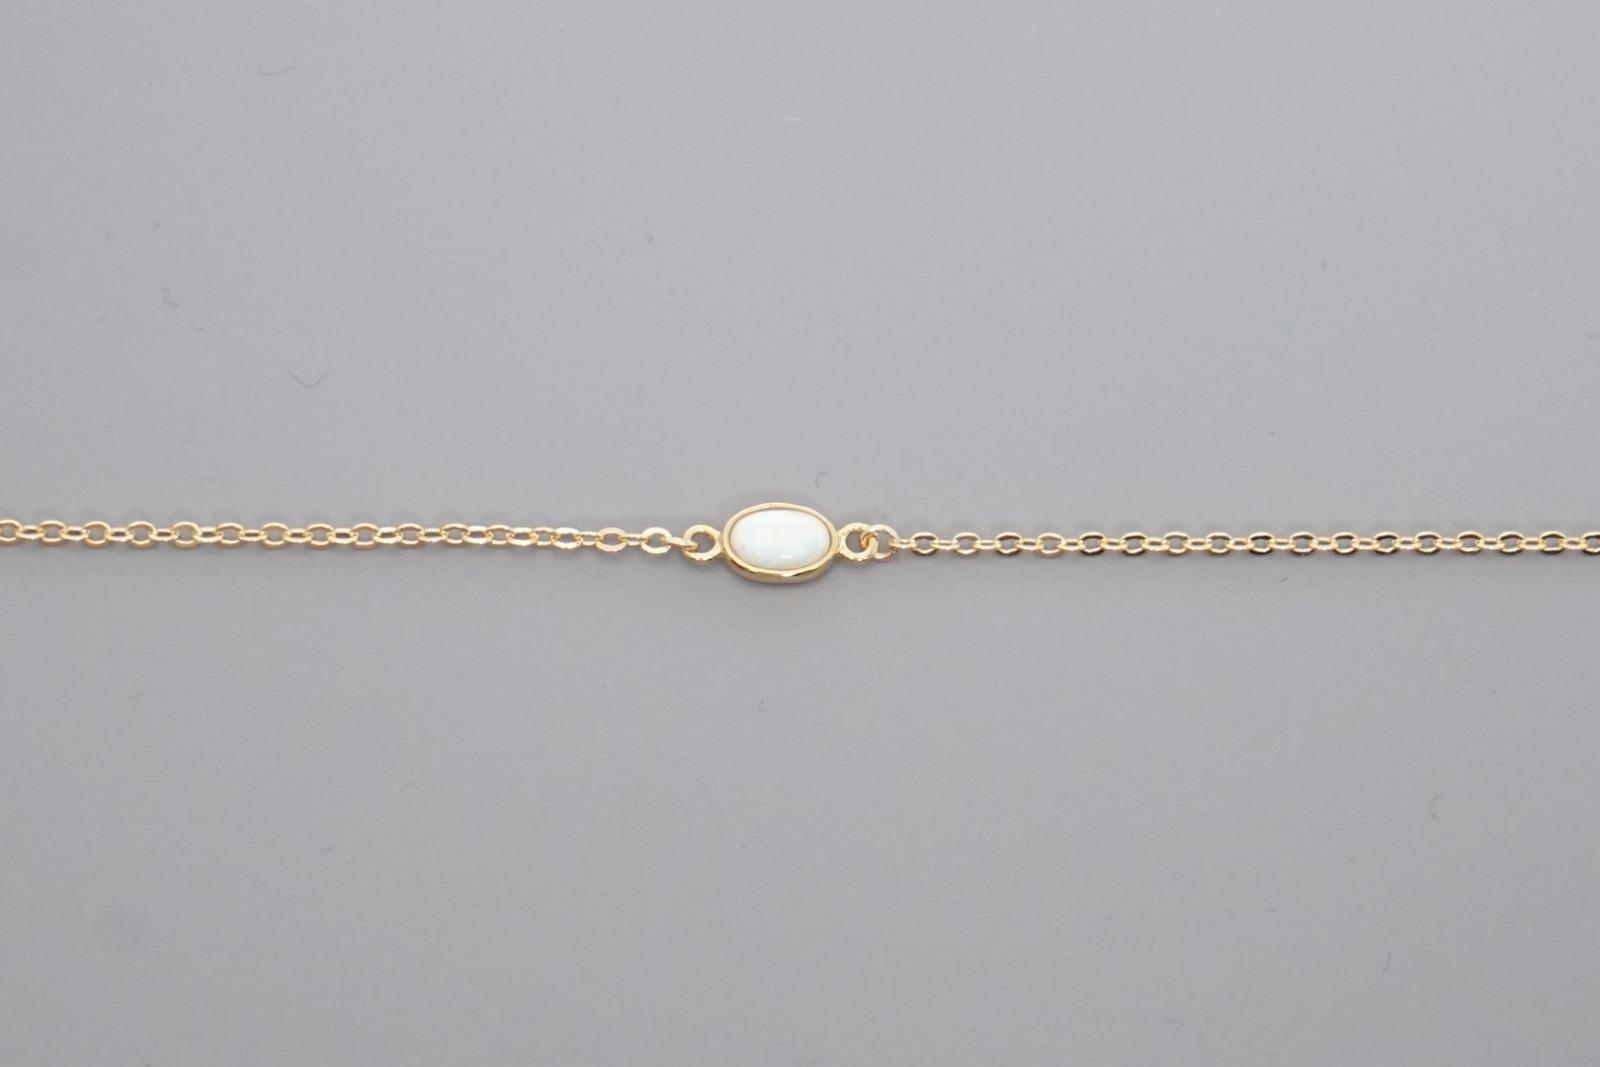 Filigranes Armband vergoldet mit Opal - 2